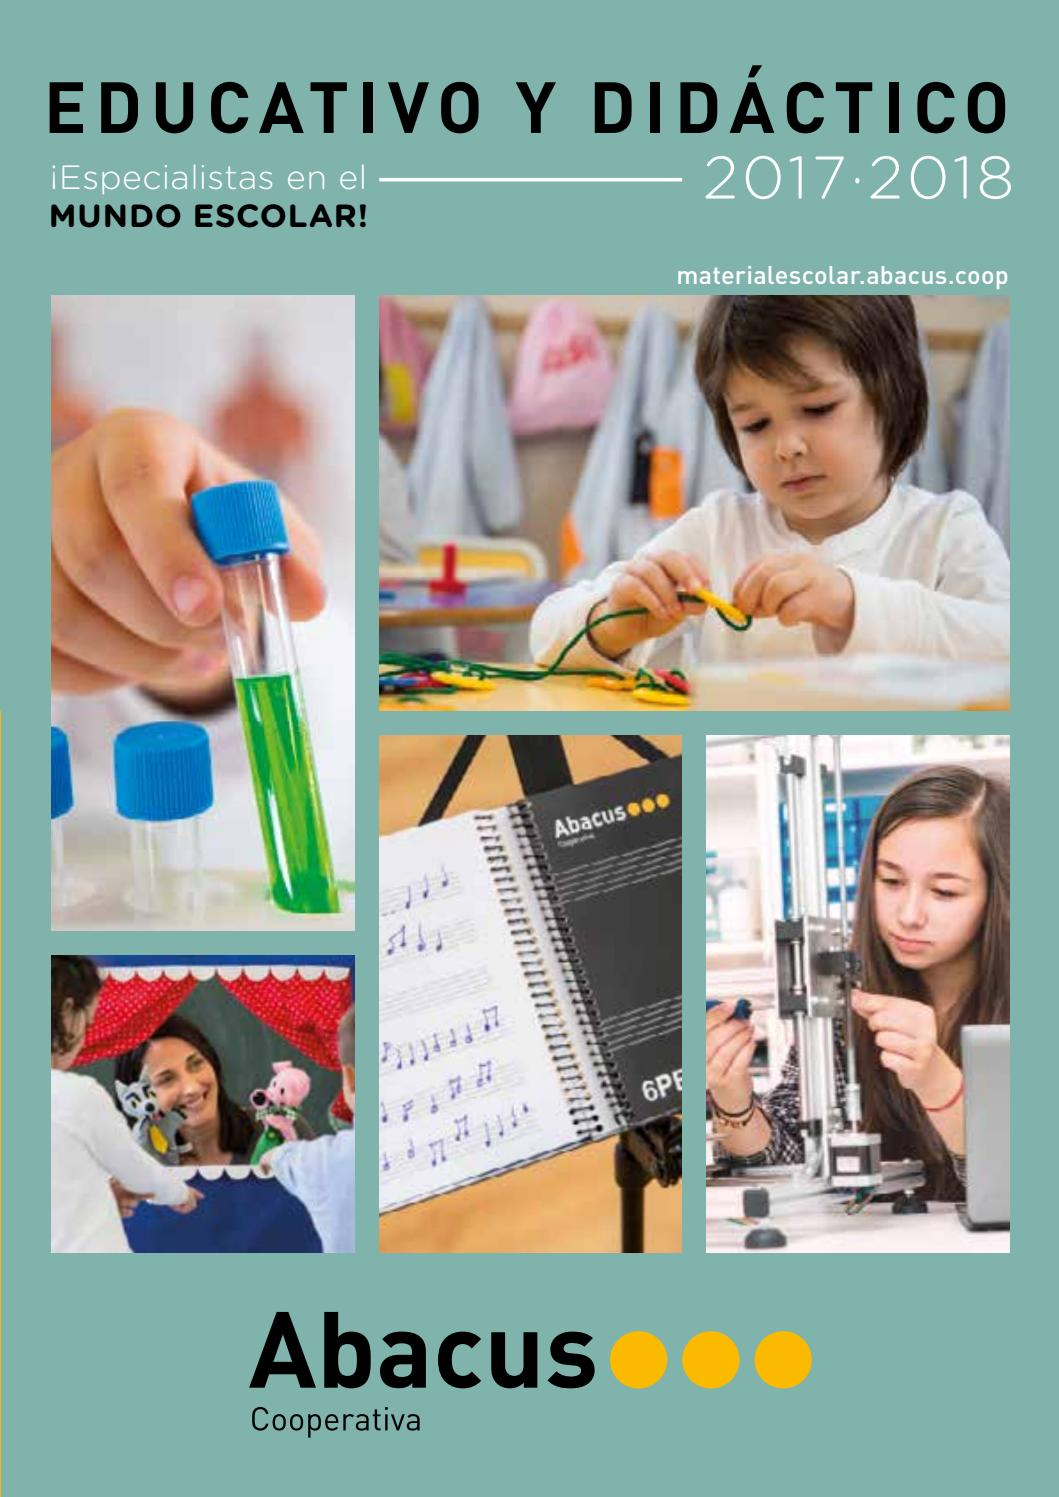 Catálogo Educativo y Didáctico 2017-2018 by Abacus cooperativa - issuu ab817cf0d2f4